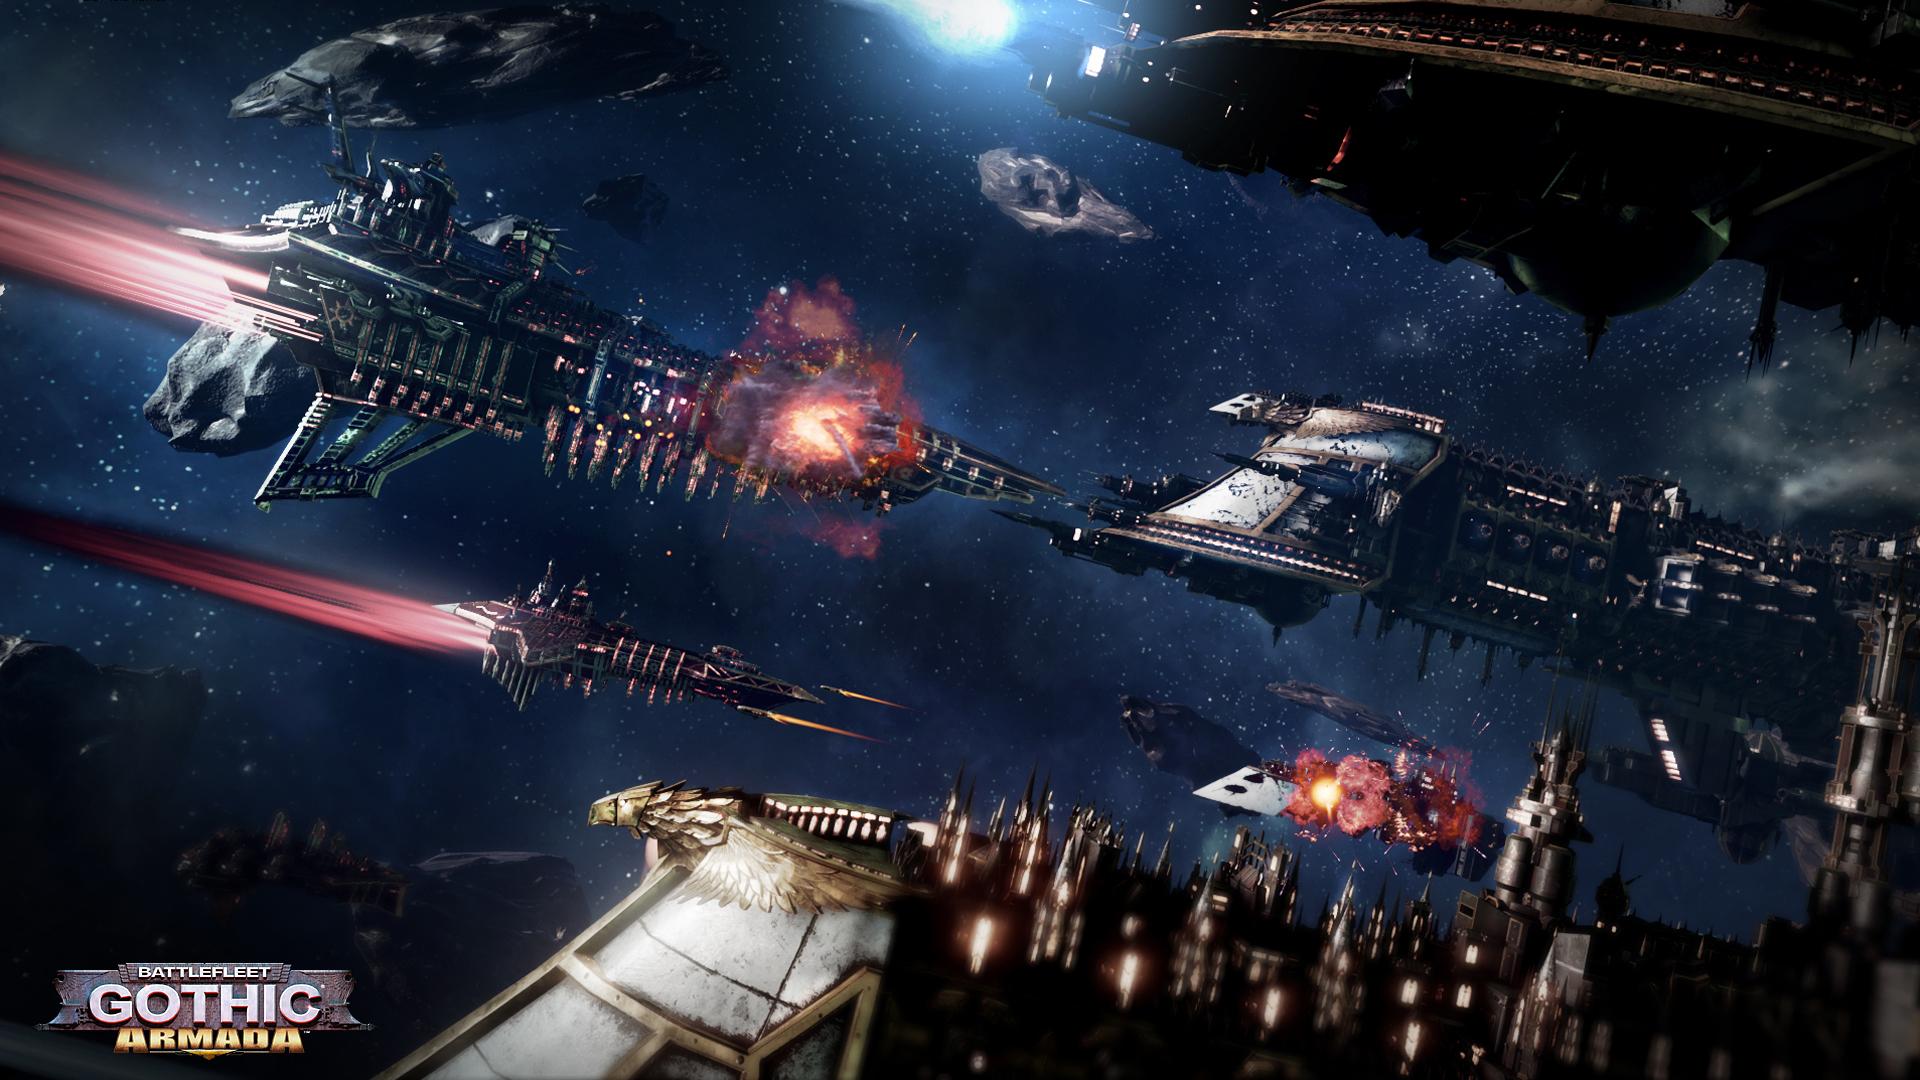 [Jeu vidéo] Battlefleet Gothic : Armada - Page 2 1433846605-9937-capture-d-ecran-pc